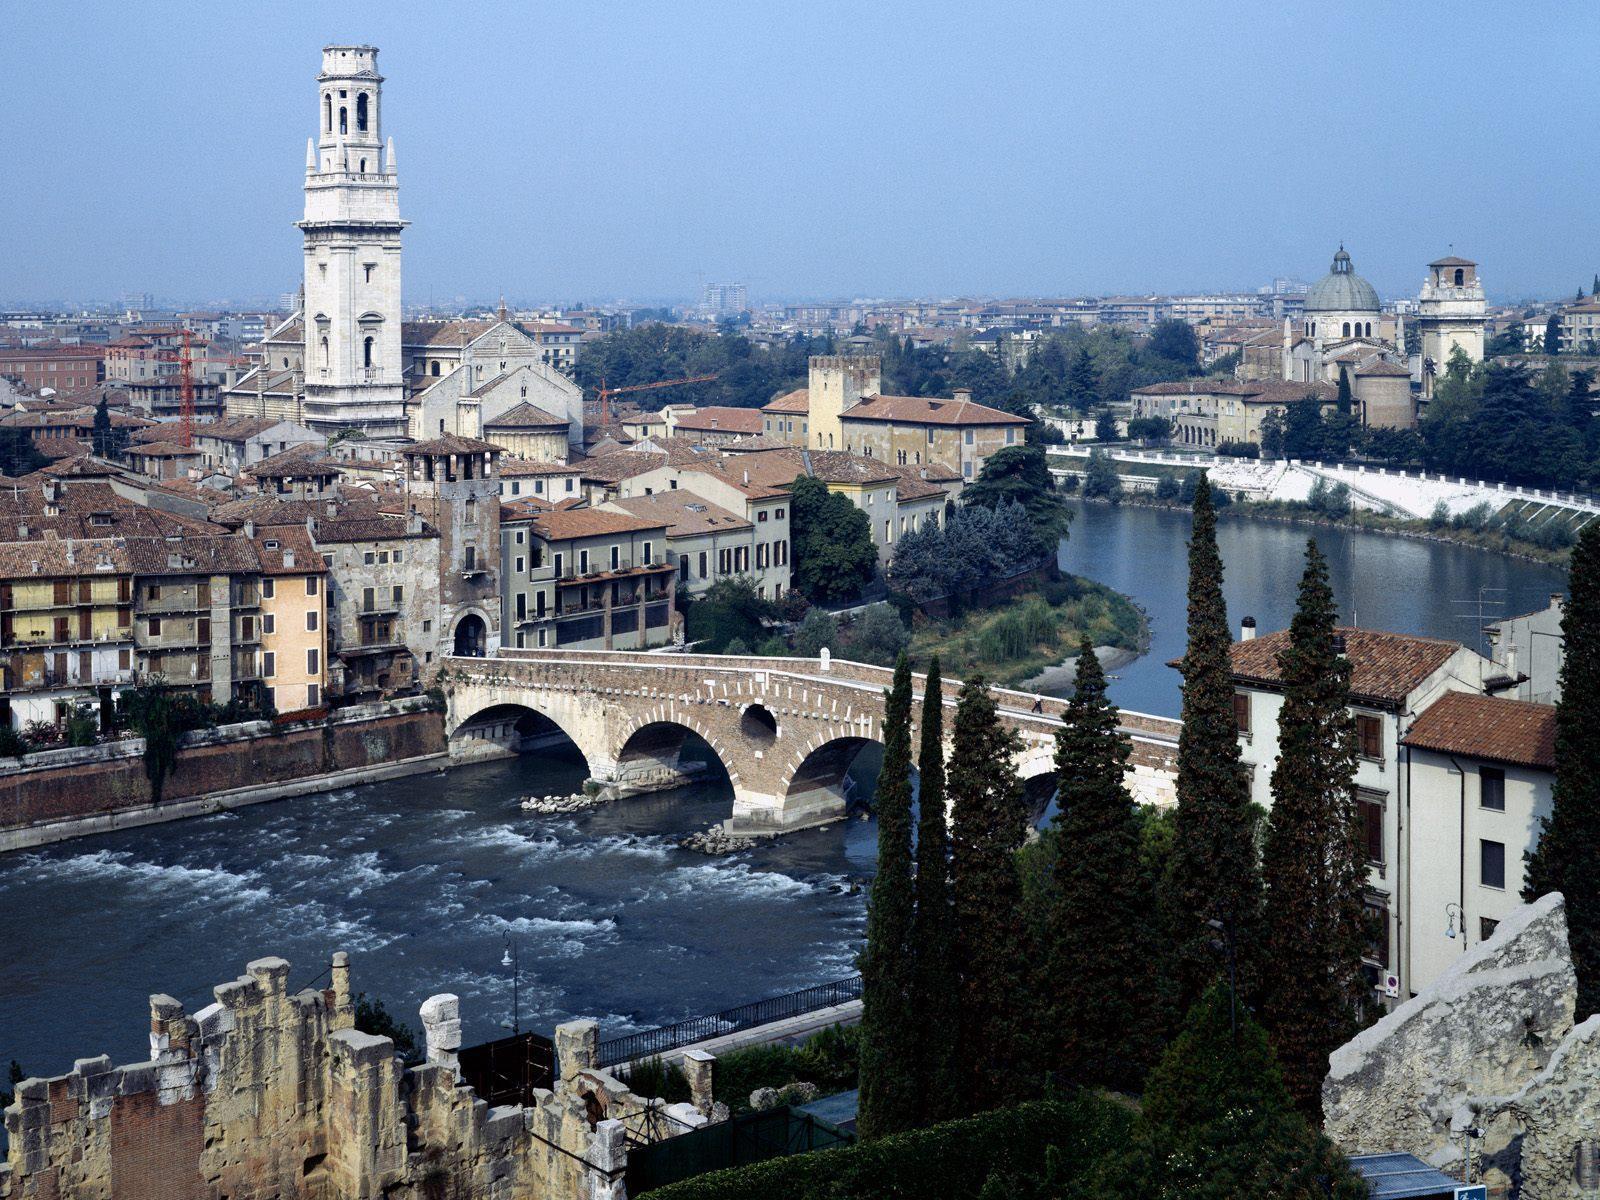 Meteo Verona 11-12-13 Ottobre 2013